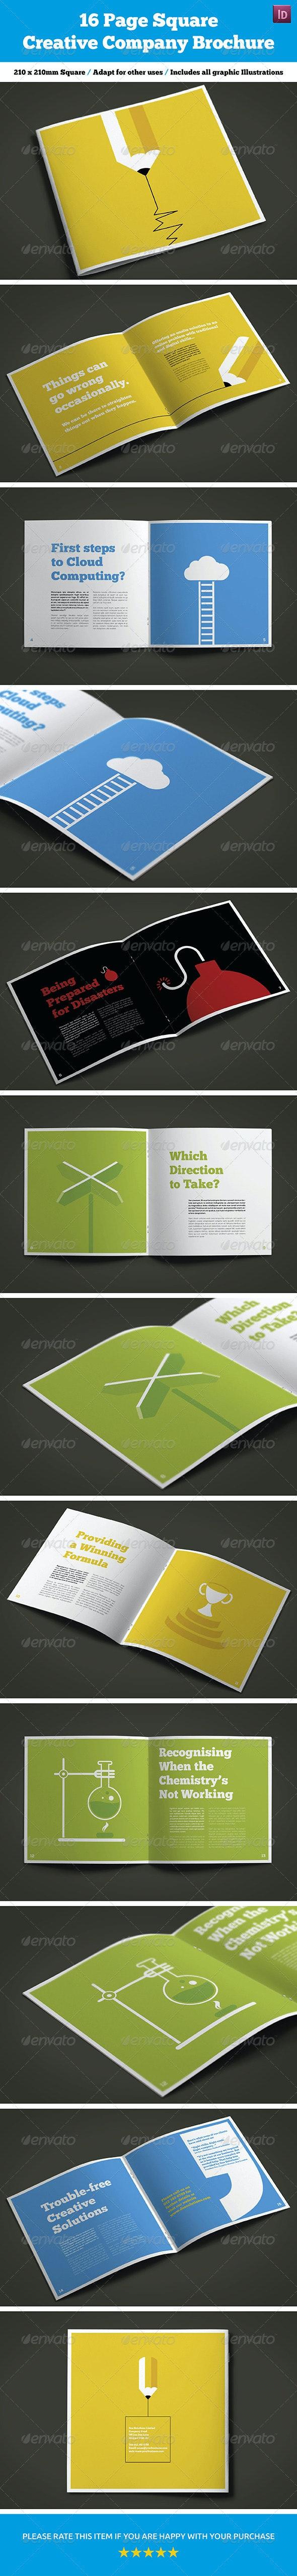 16 Page Square Creative Company Brochure - Brochures Print Templates